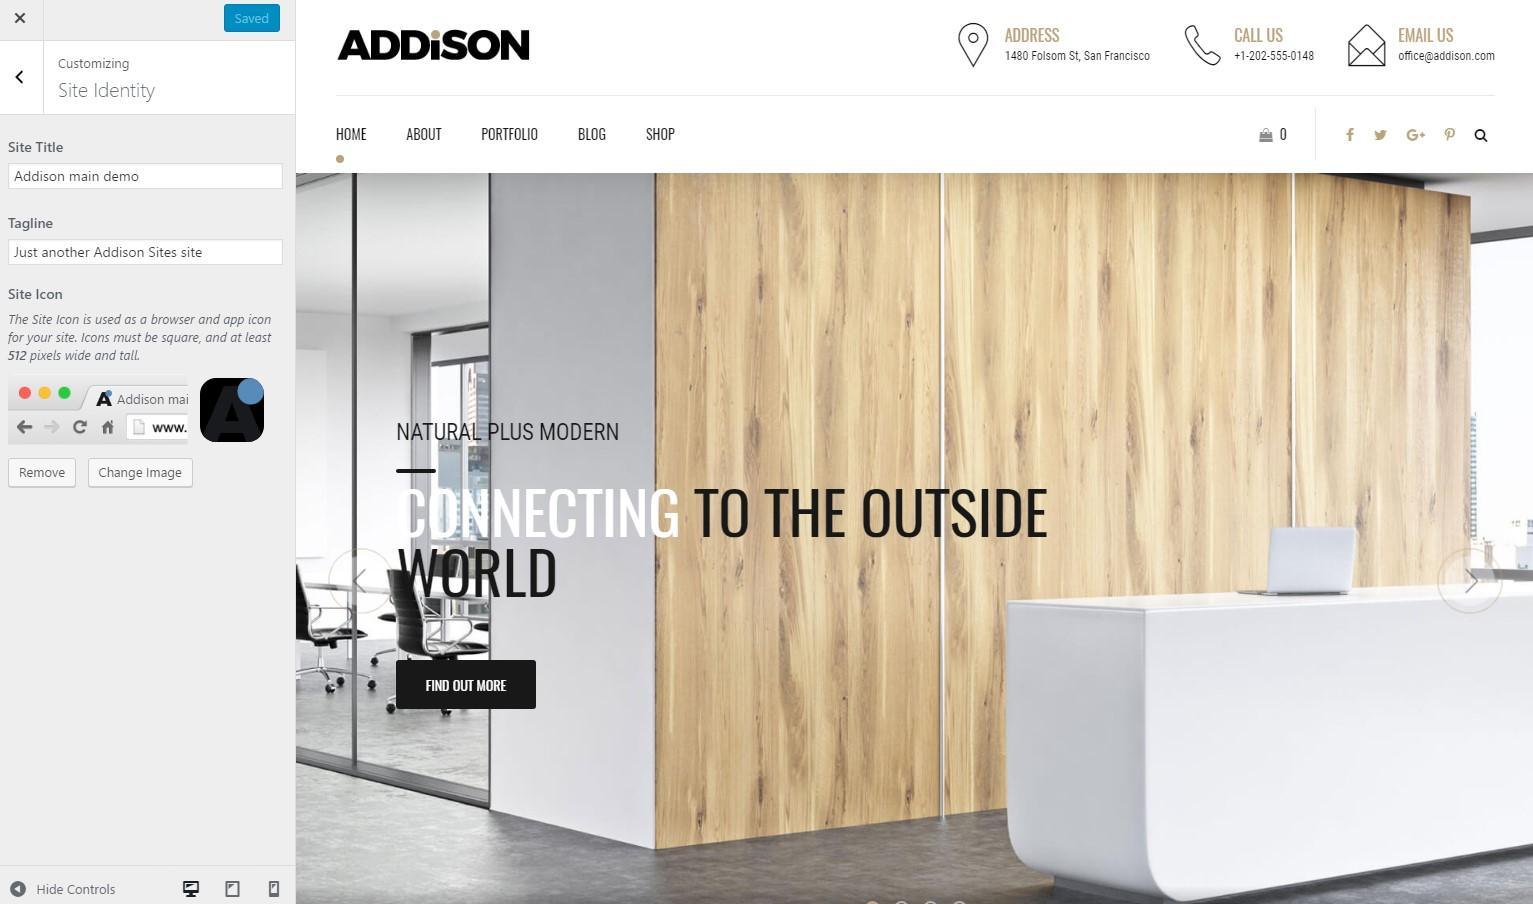 https://documentation.bold-themes.com/addison/wp-content/uploads/sites/18/2017/06/site-identity.jpg